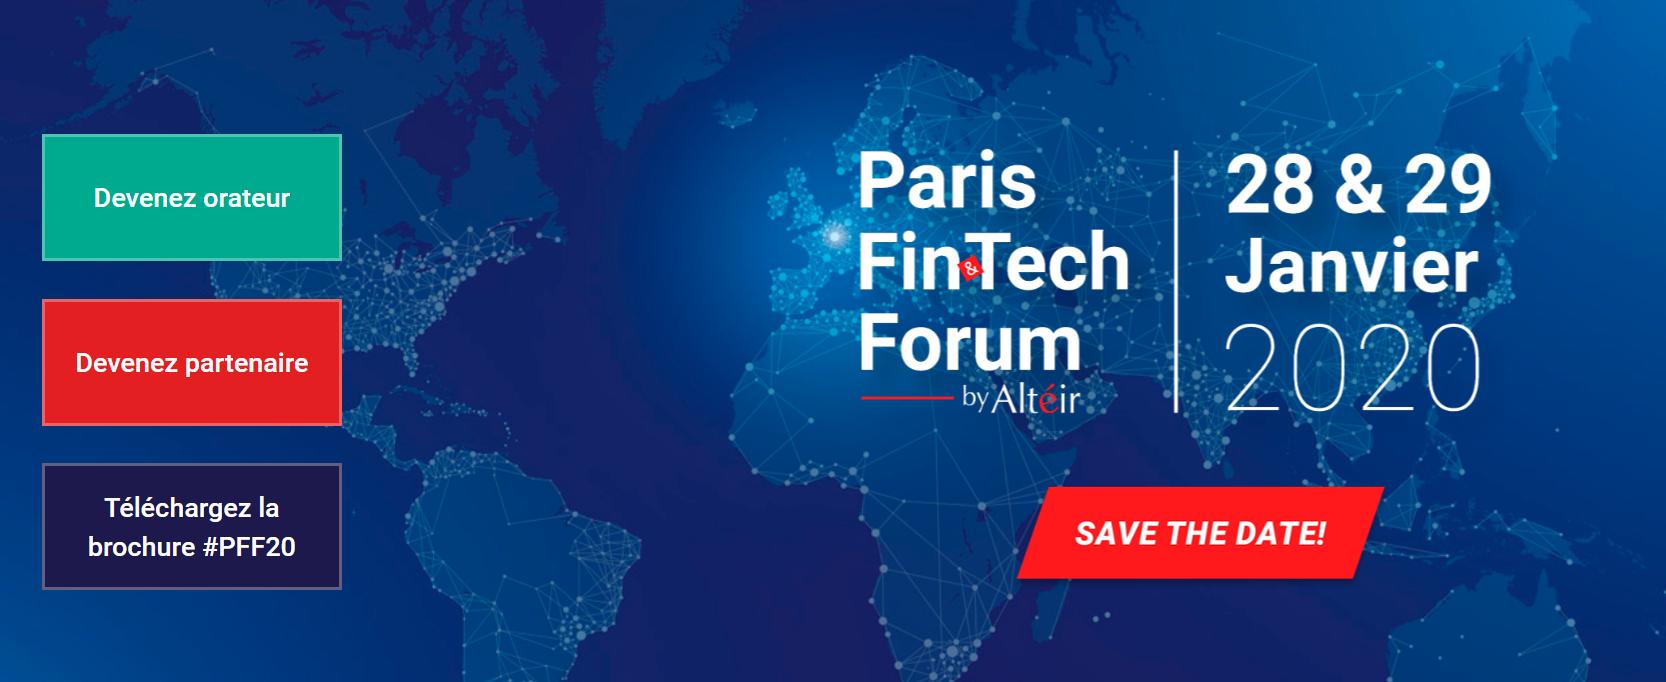 Événement fintech 2019 - Paris Fintech Forum